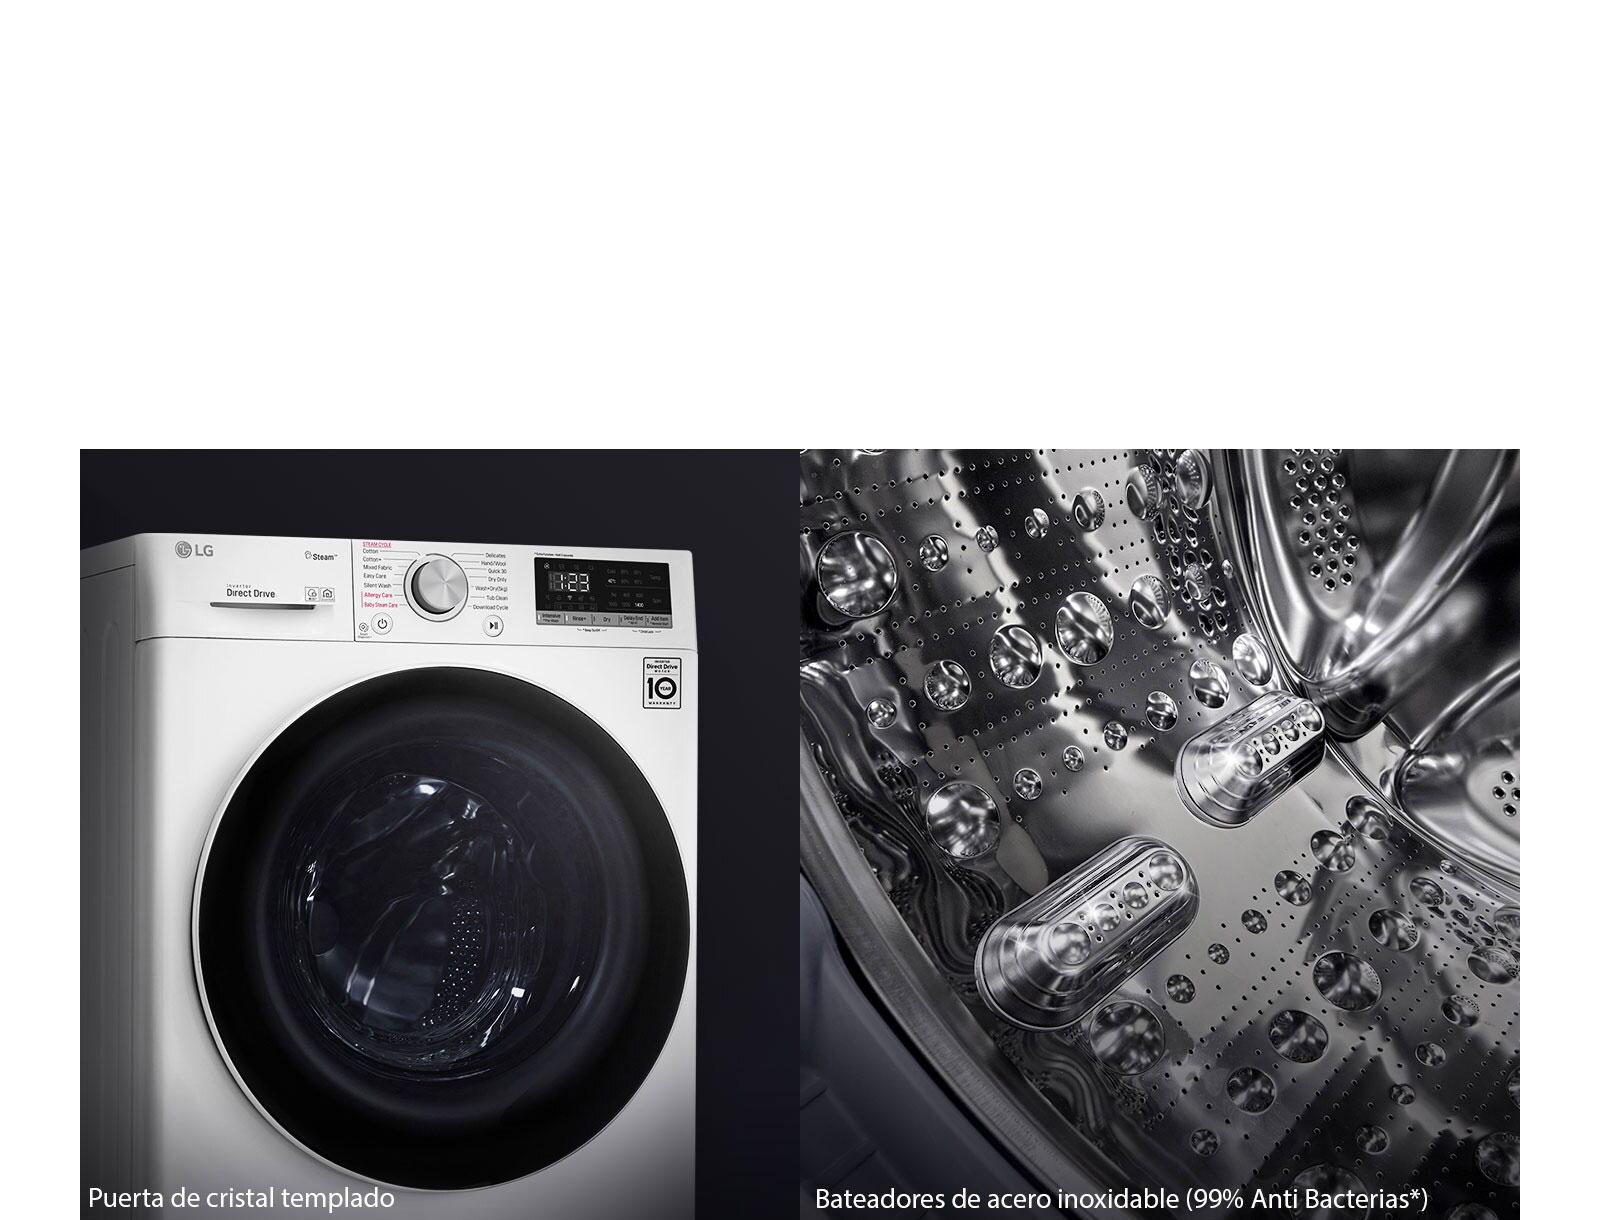 WD-Vivace-V400-C4R-White-06-1-Druability-Desktop_v100